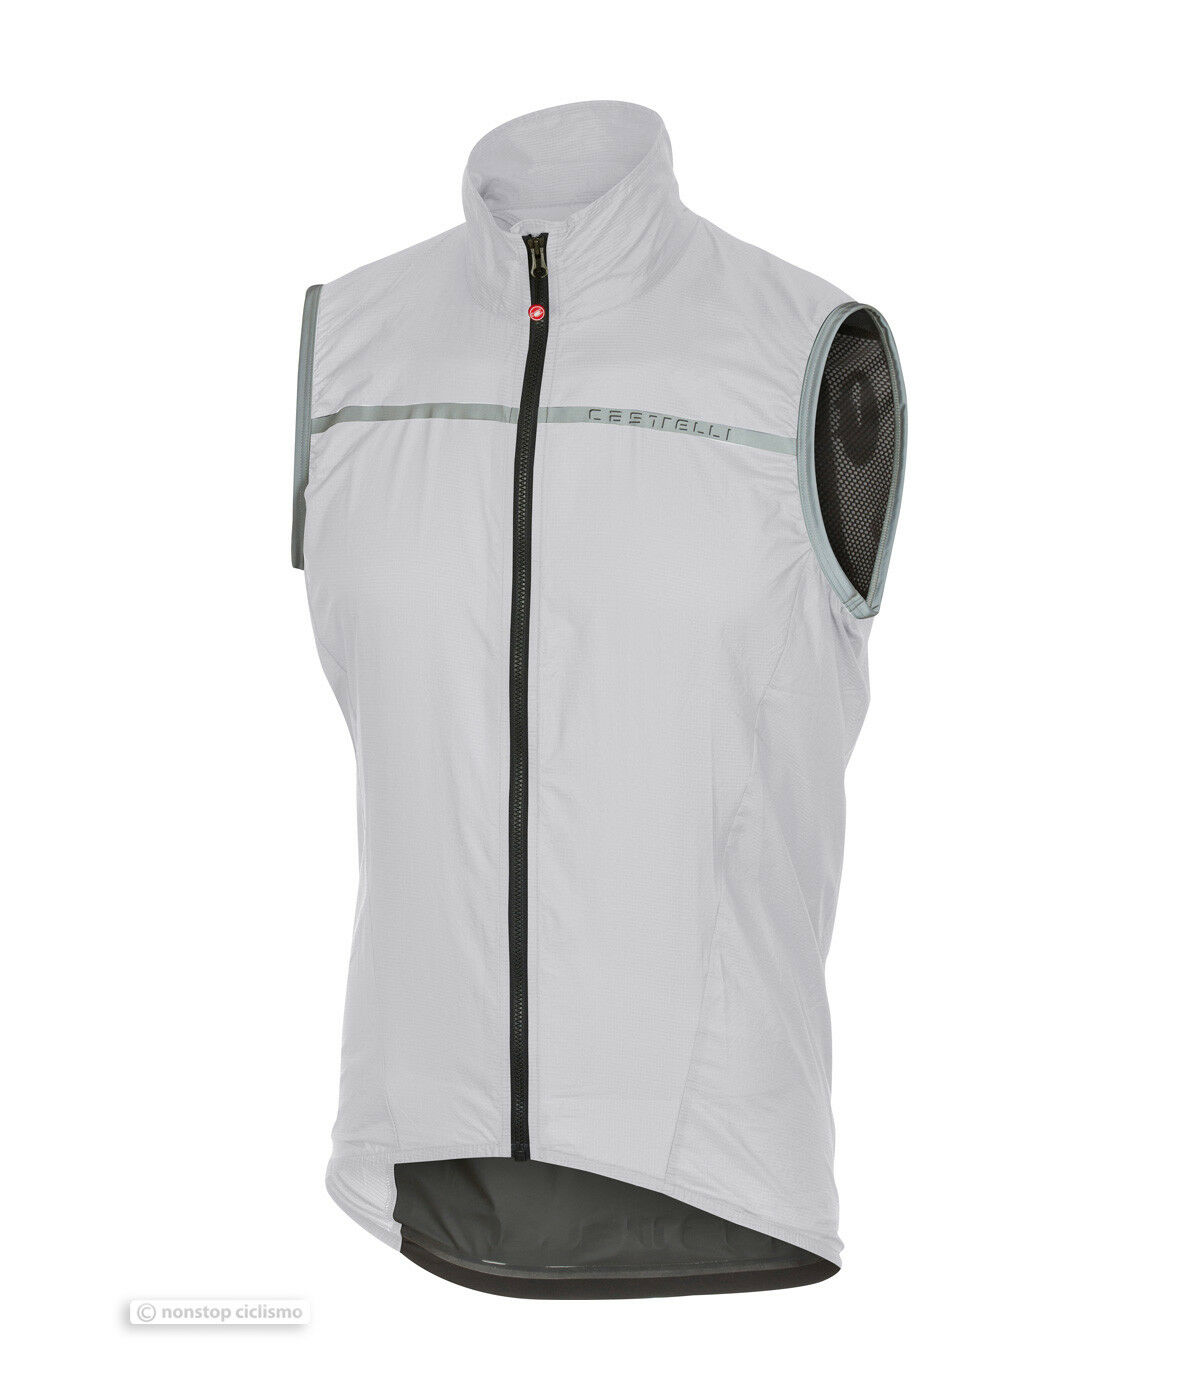 NEW Castelli  SUPERLEGGERA Wind Proof Cycling Vest   WHITE  perfect